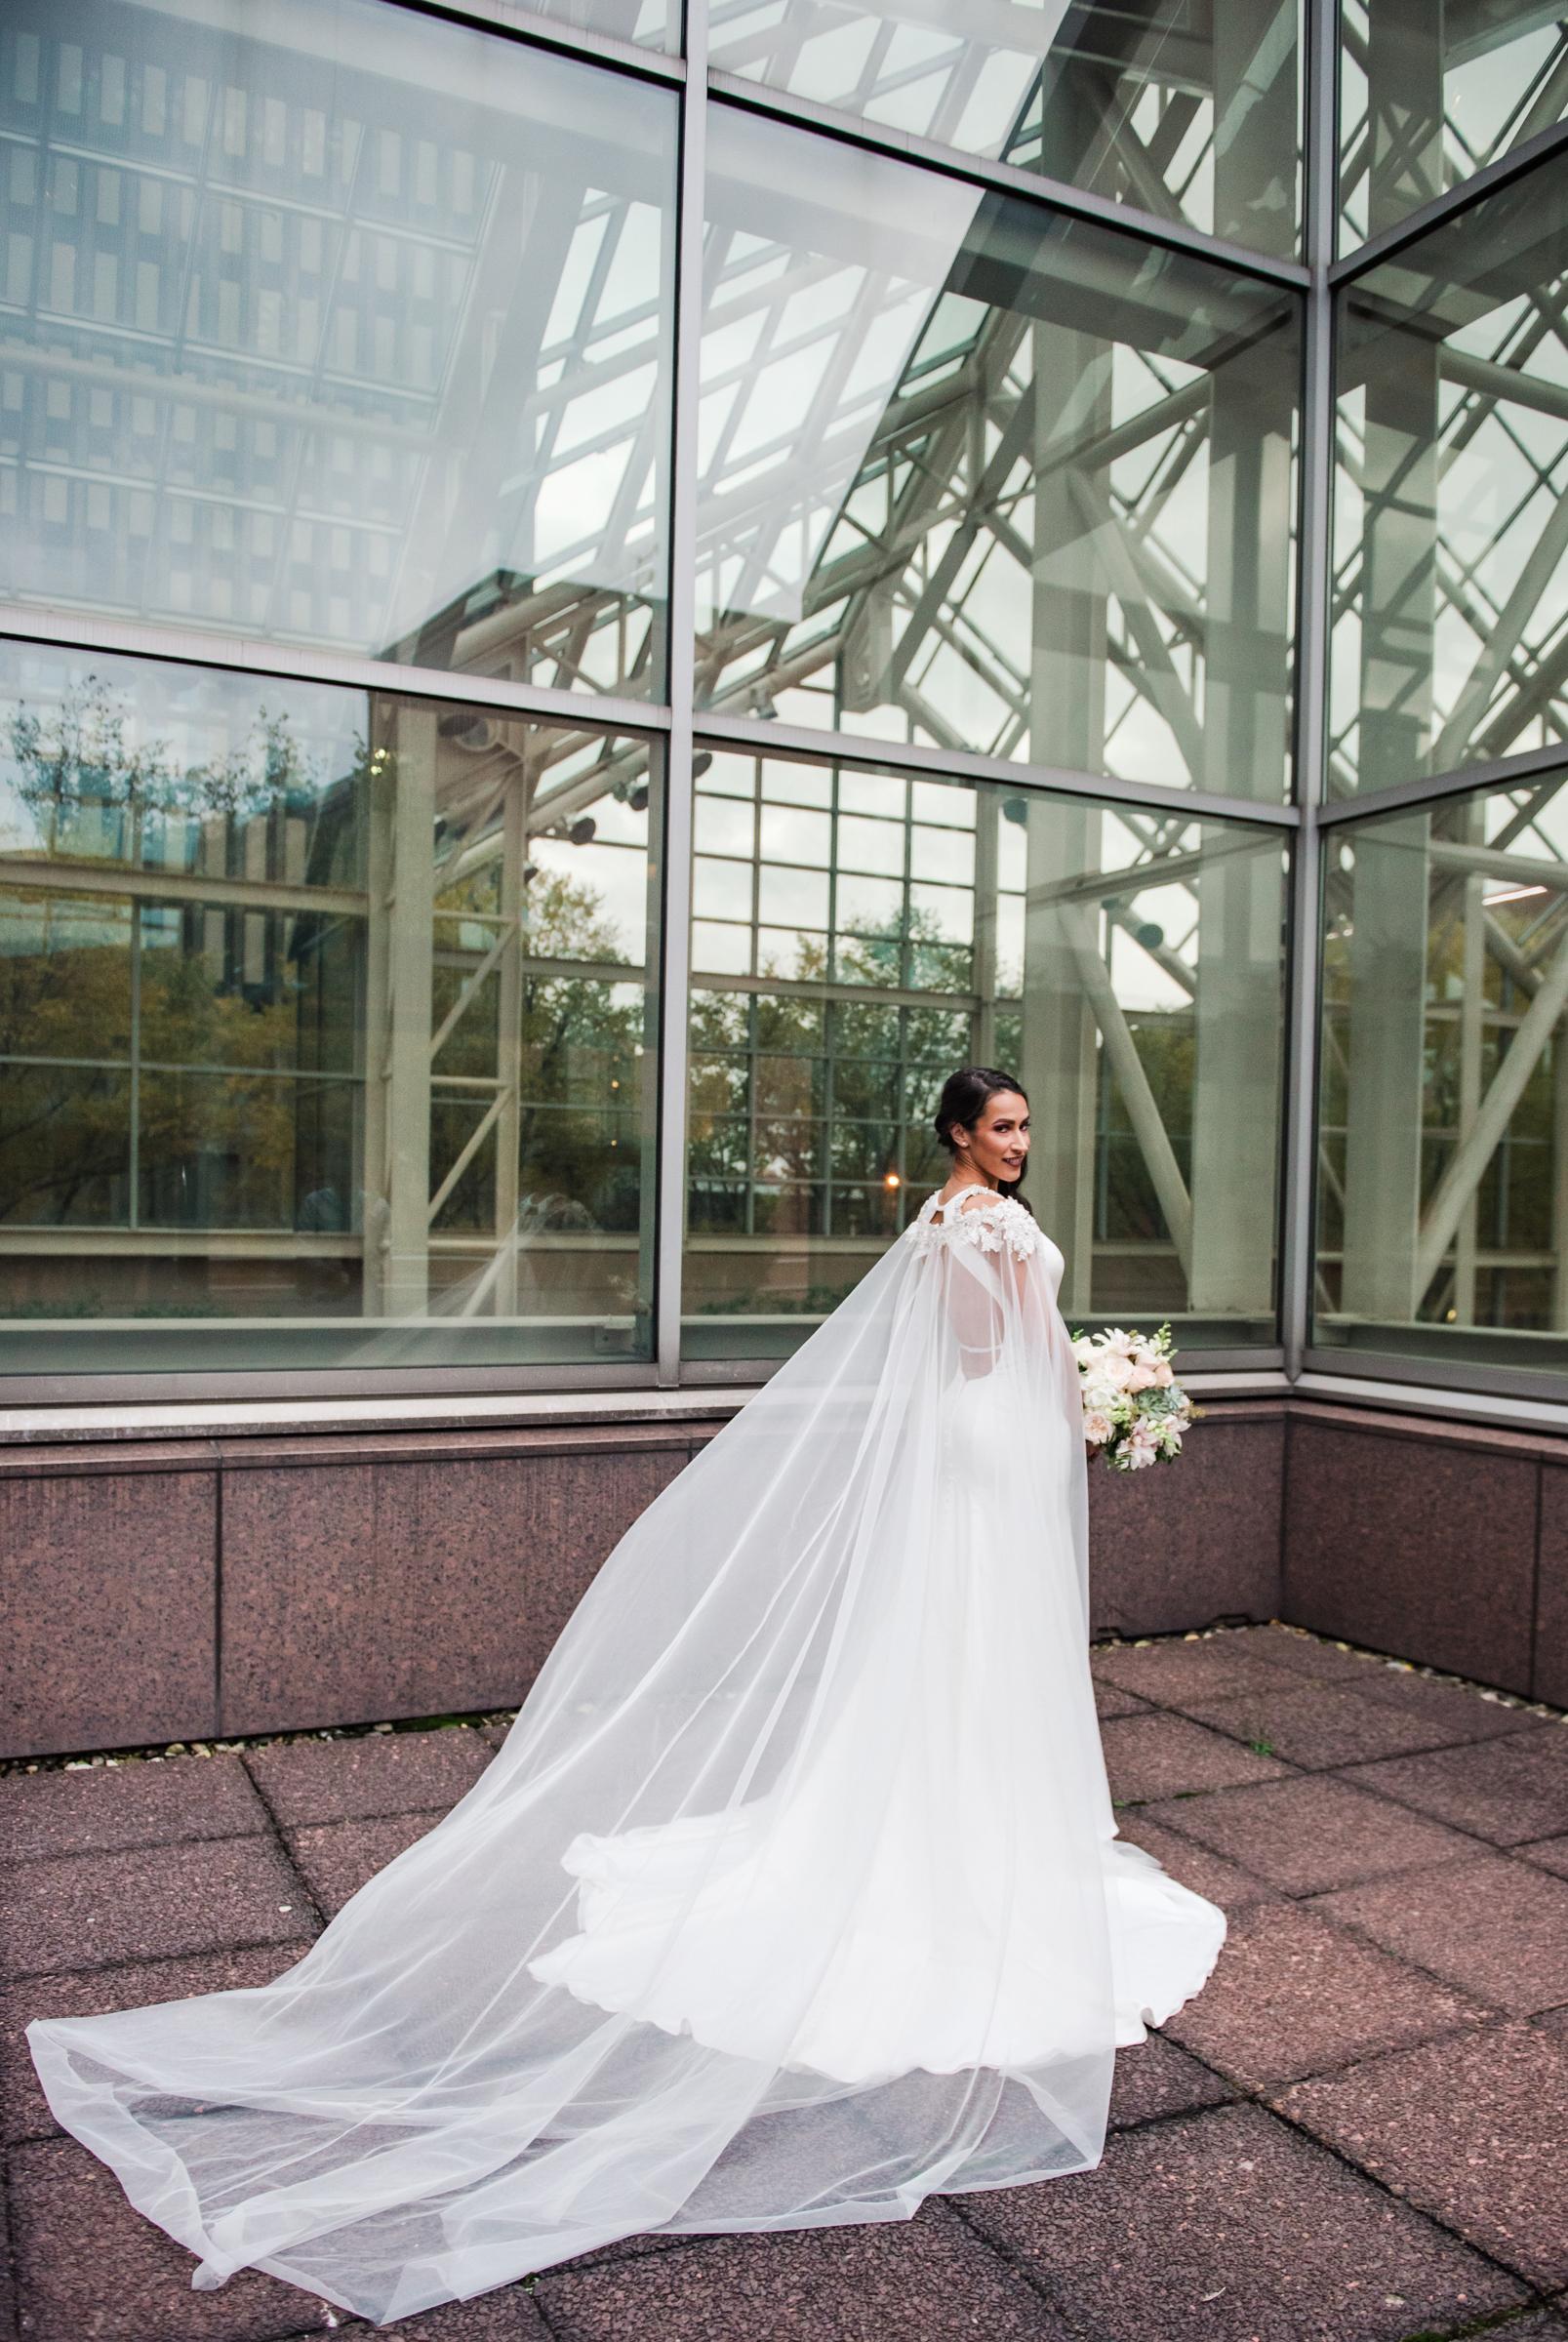 Wintergarden_by_Monroes_Rochester_Wedding_JILL_STUDIO_Rochester_NY_Photographer_174648.jpg